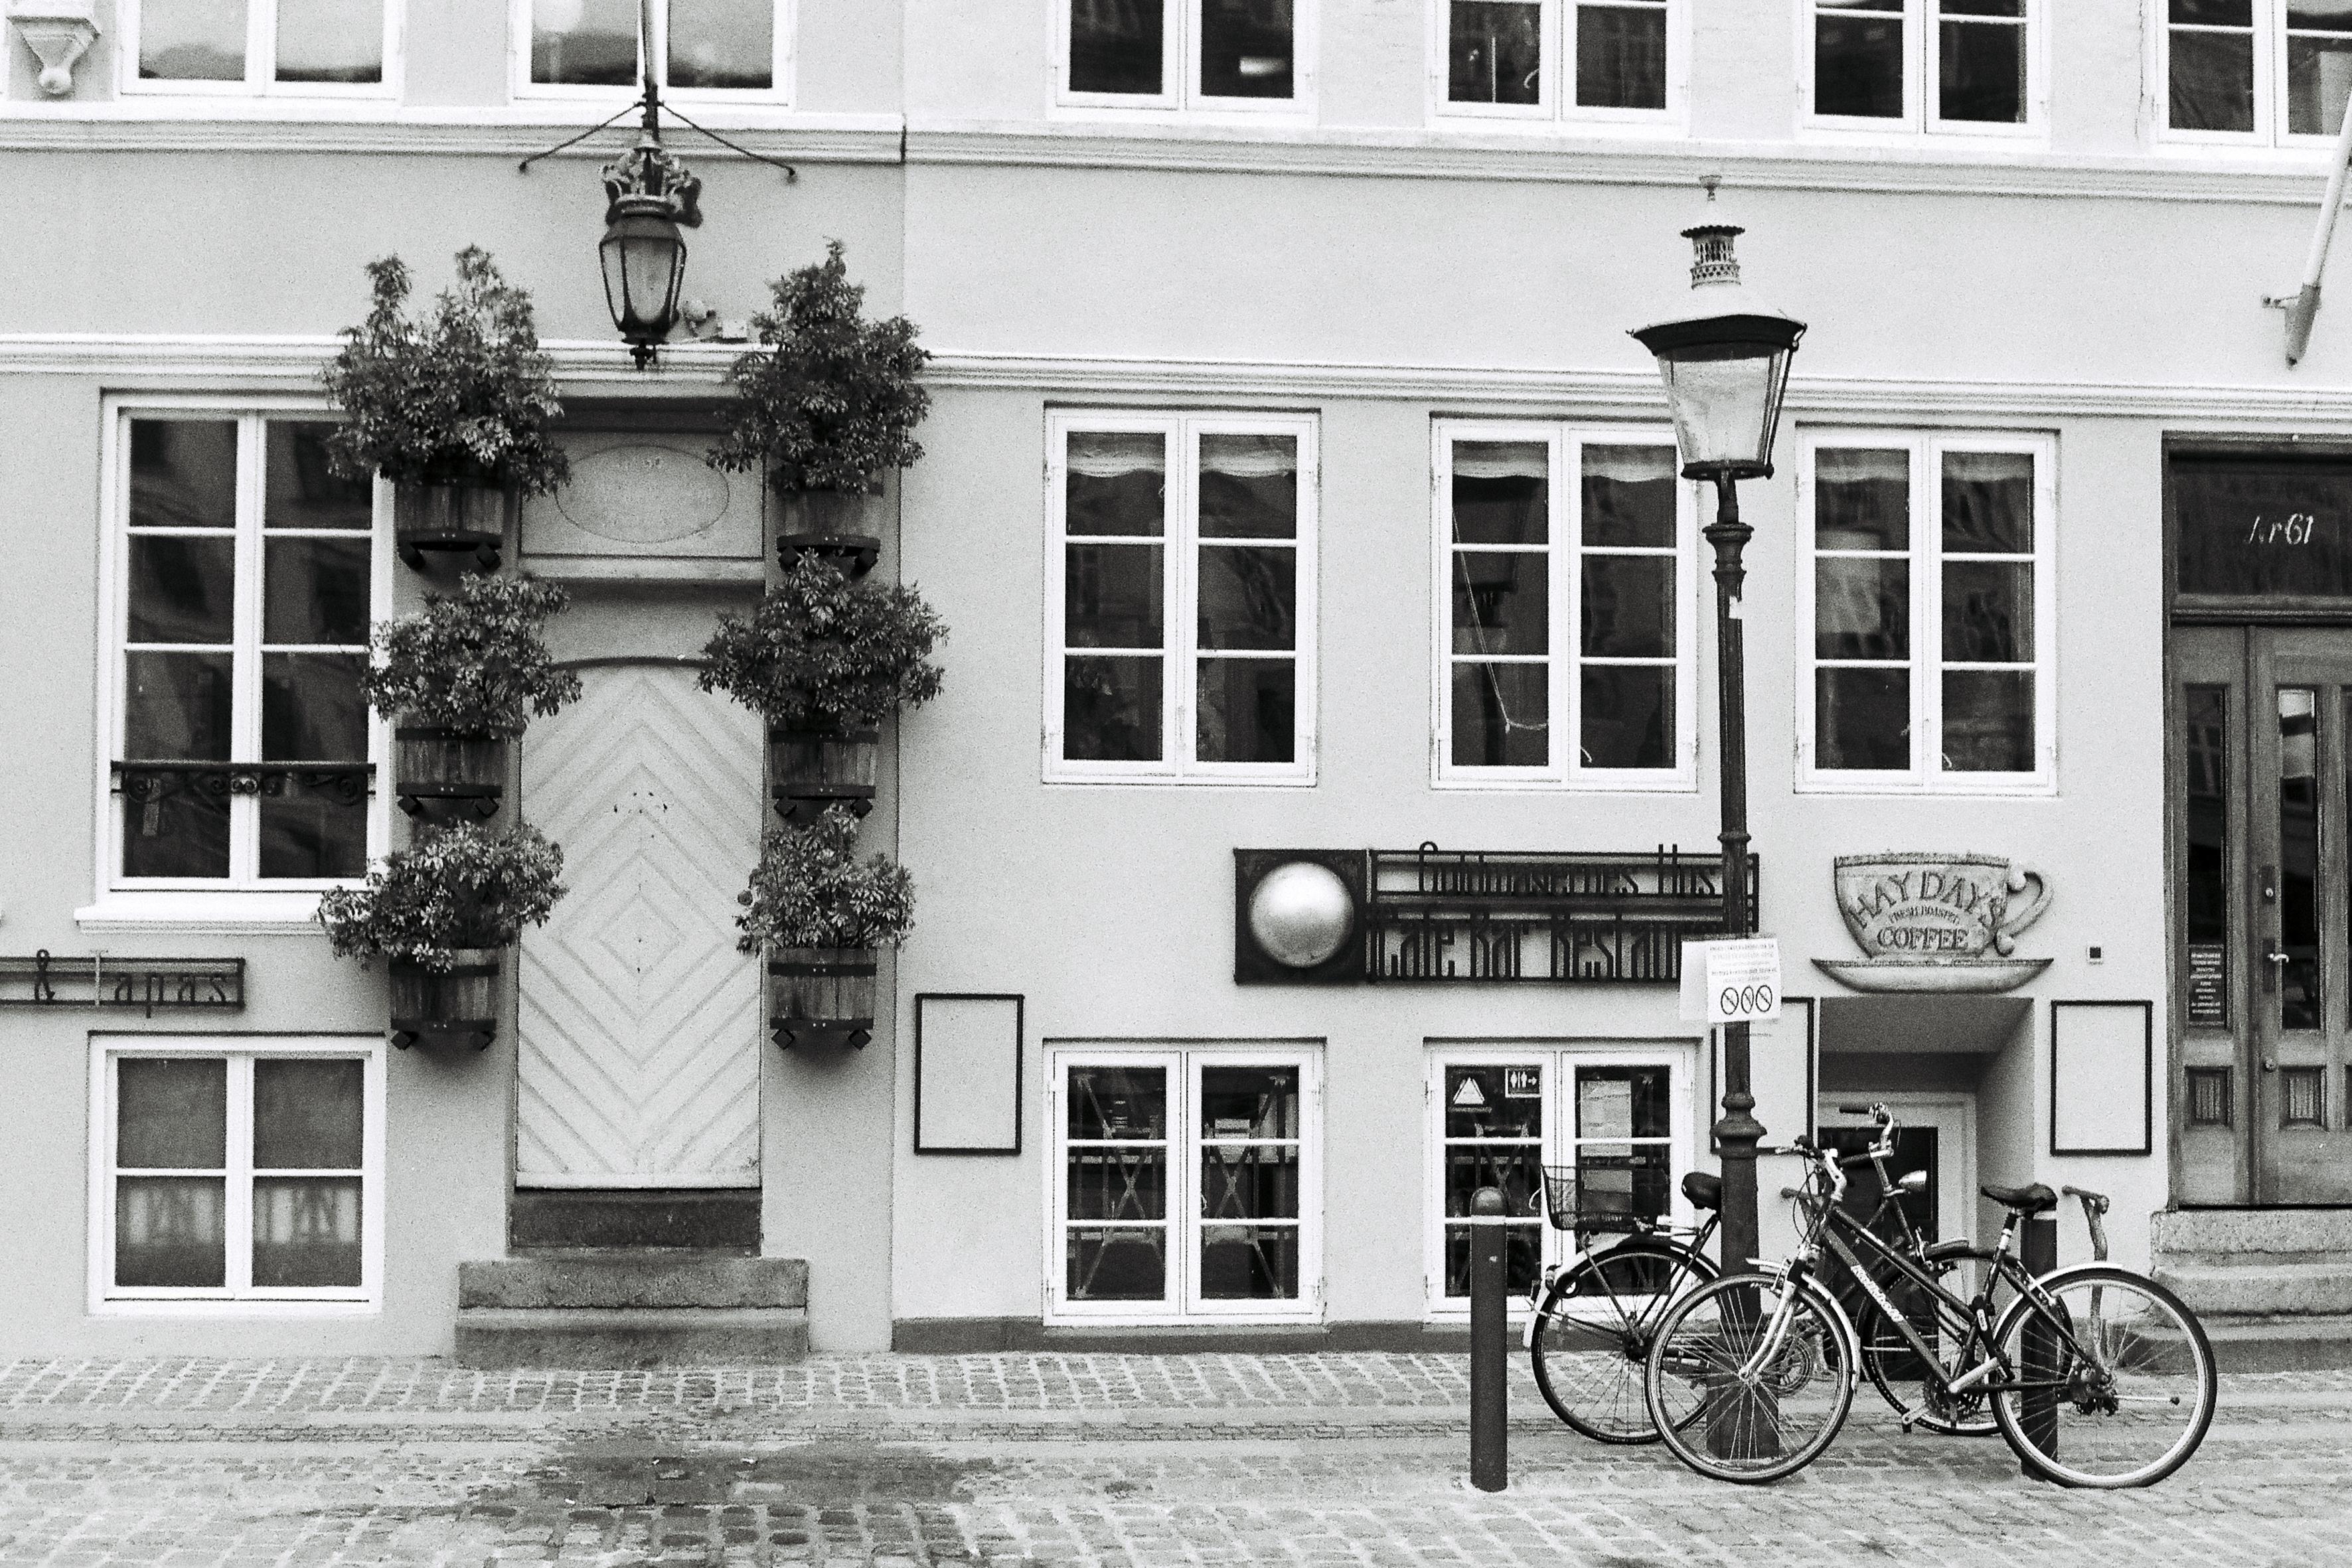 Bicycle Beside Building